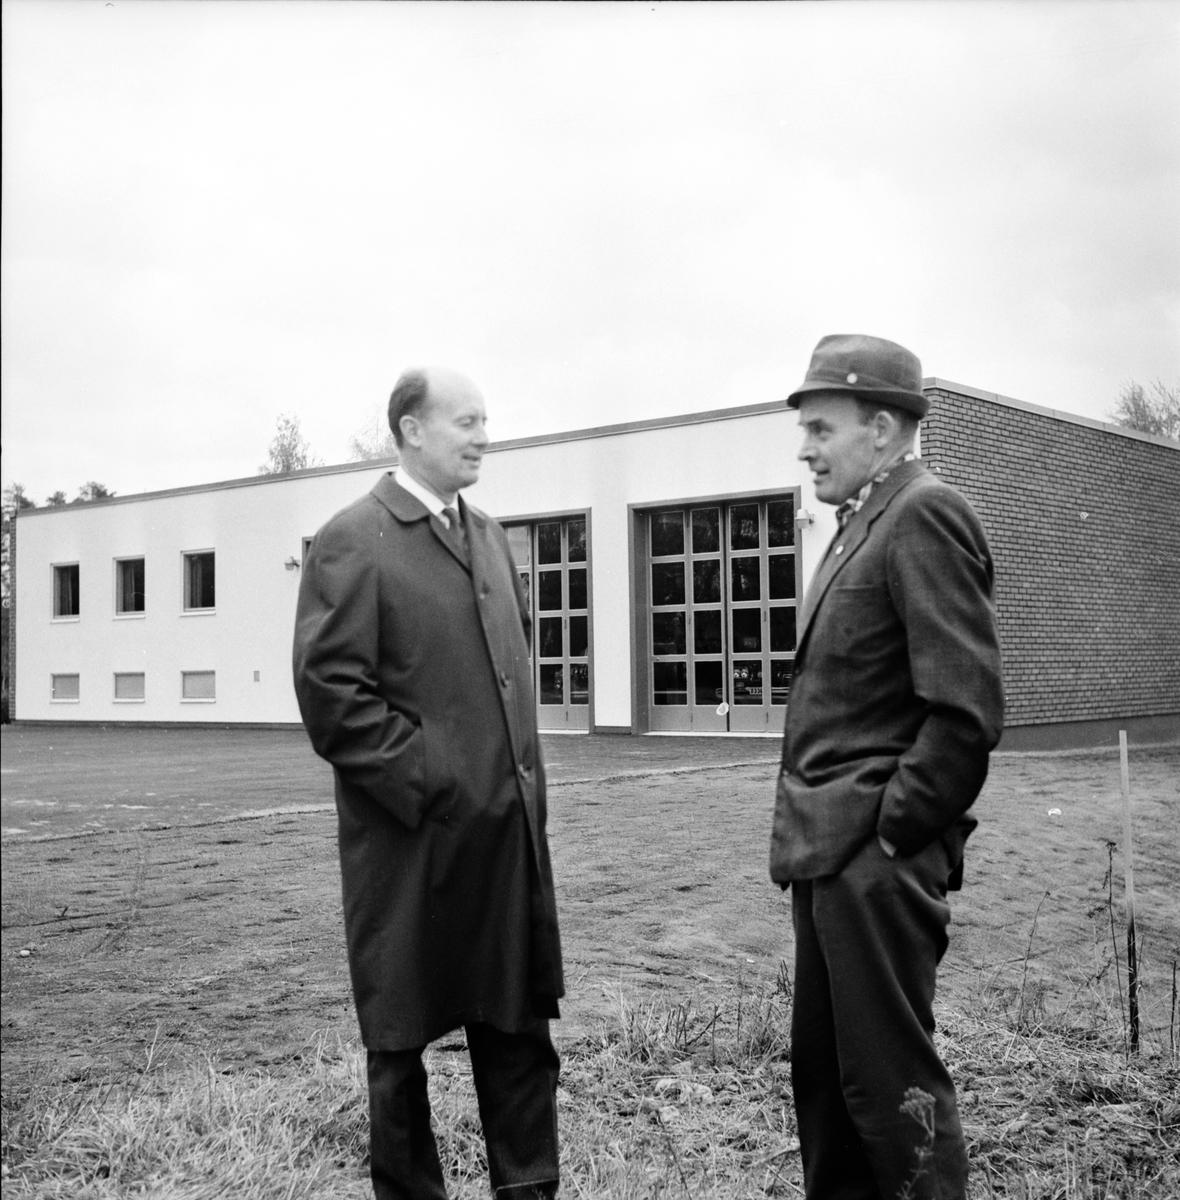 Arbrå, Rep. om brandkårer, 7 Oktober 1967